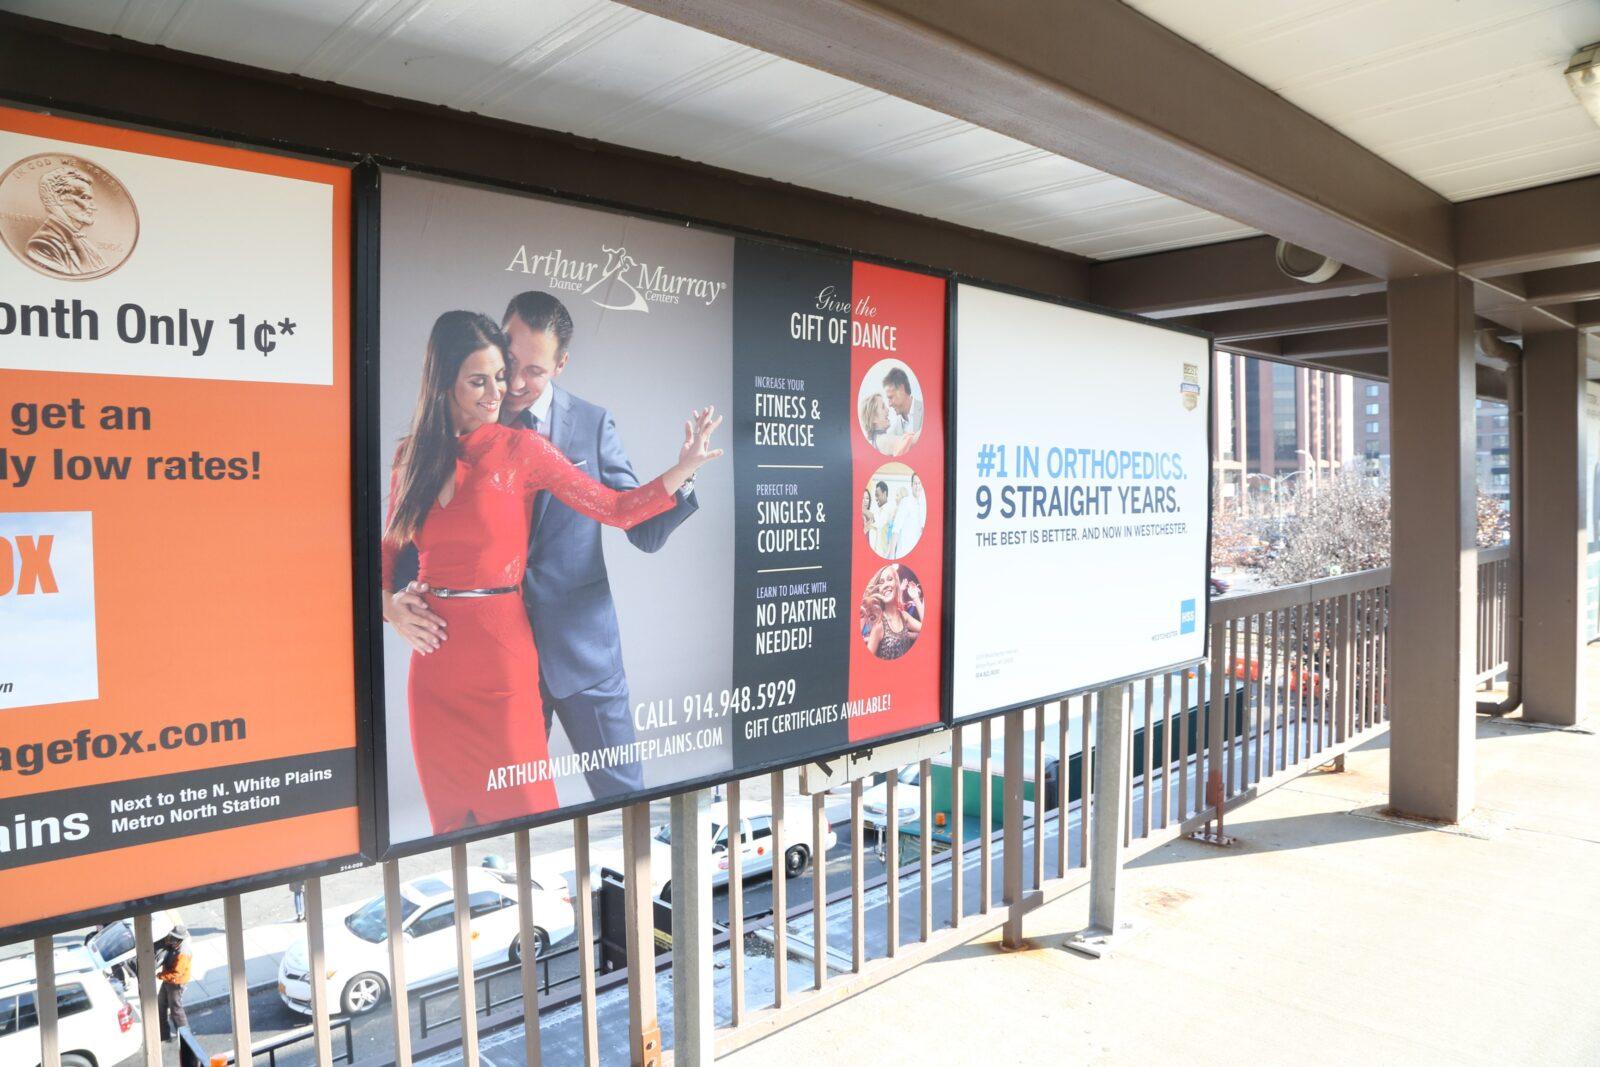 Arthur Murray Dance Studio Rail Platform Advertising Campaign